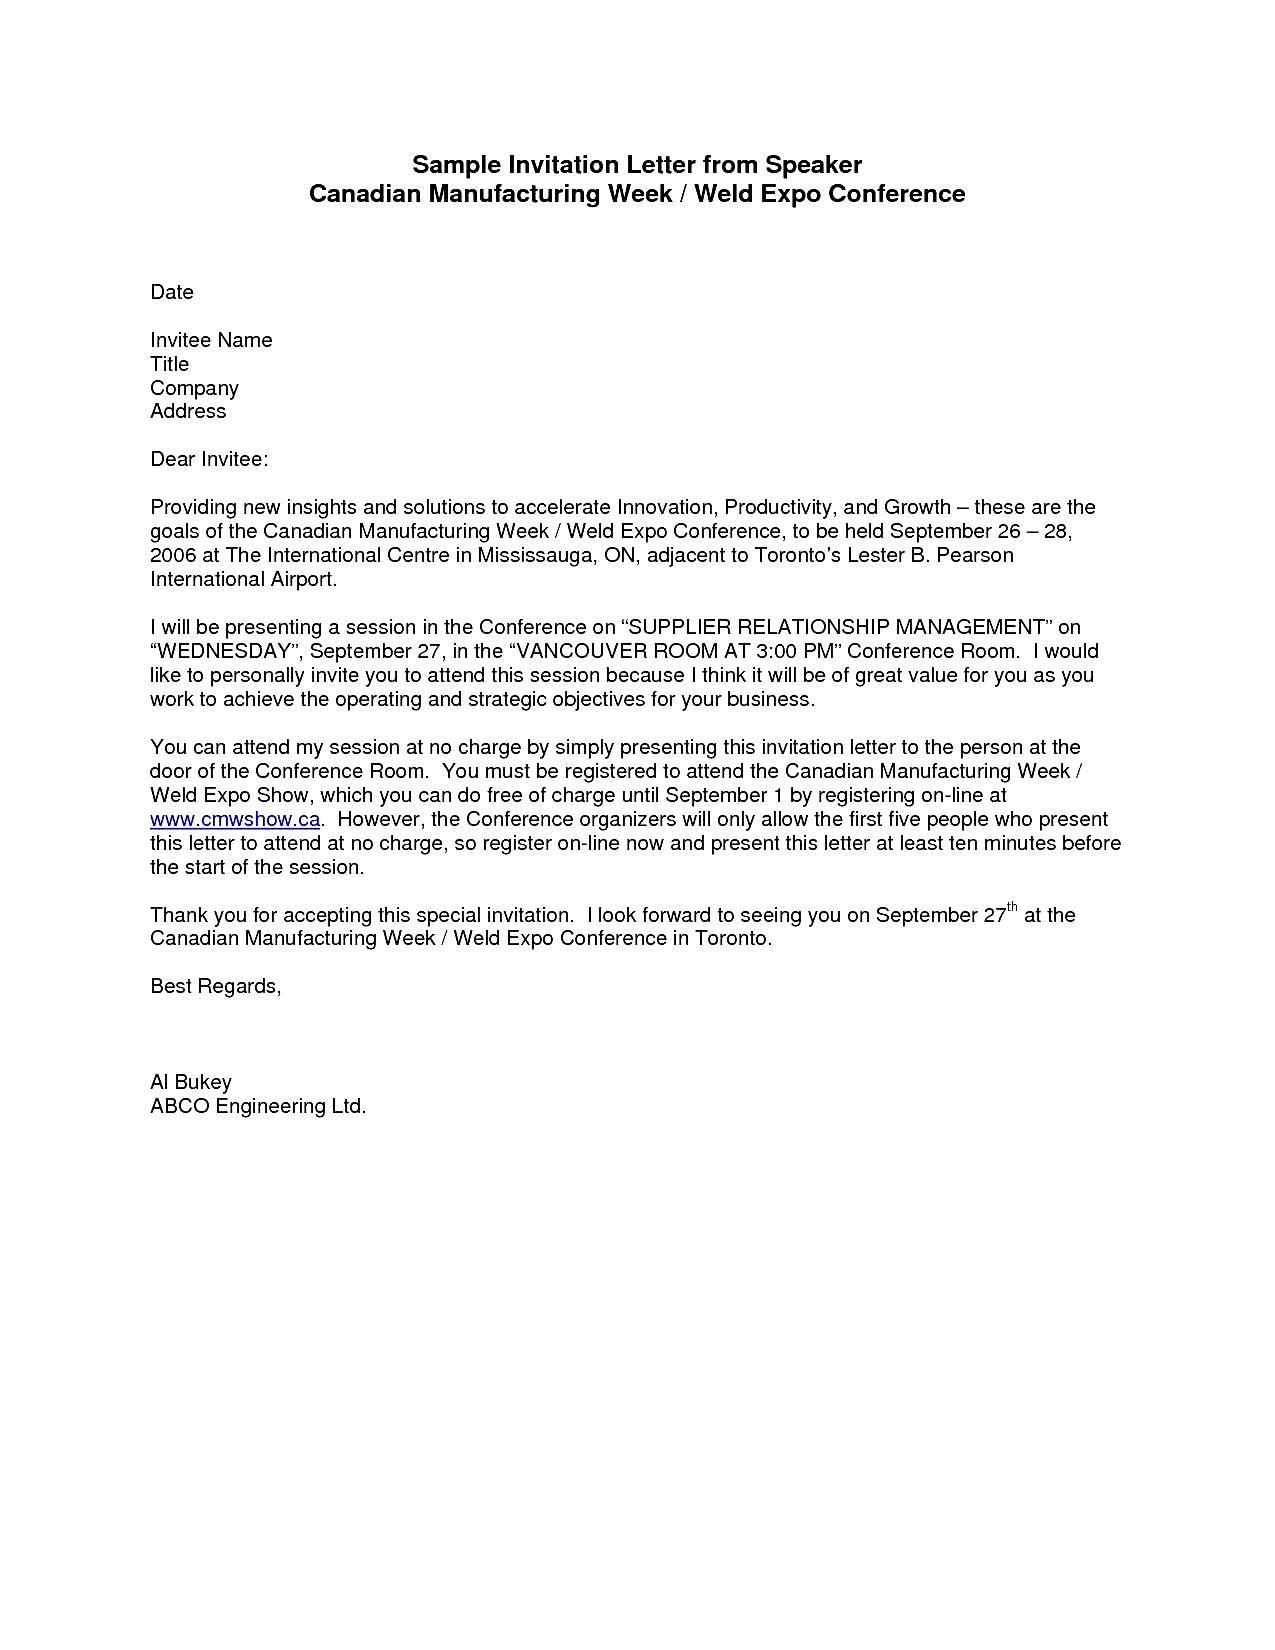 Sample Formal Invitation Letter For A Guest Speaker Besttemplate123